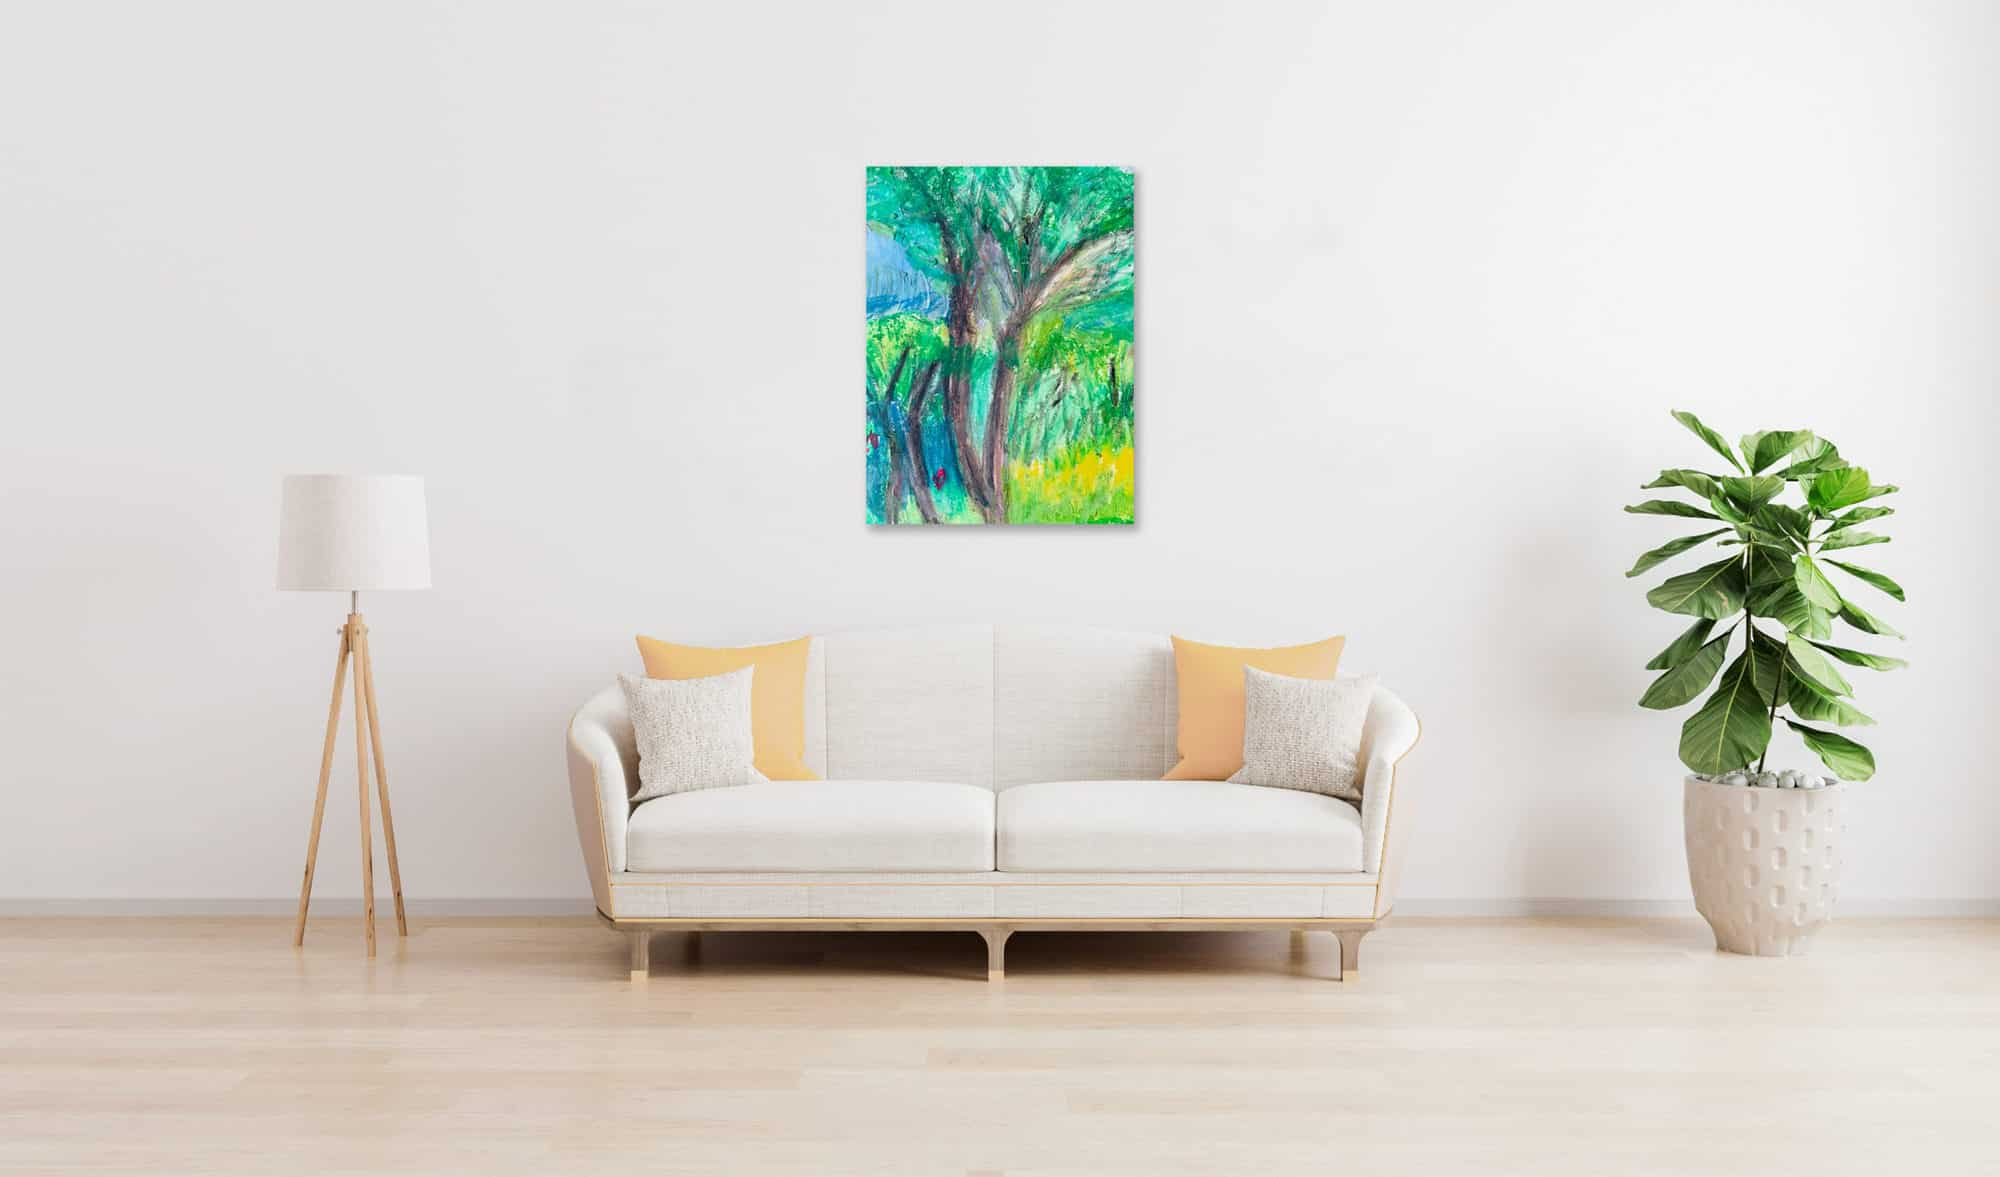 Abstraktes Ölgemälde auf Leinwand Landschaft mit Baum wandbild